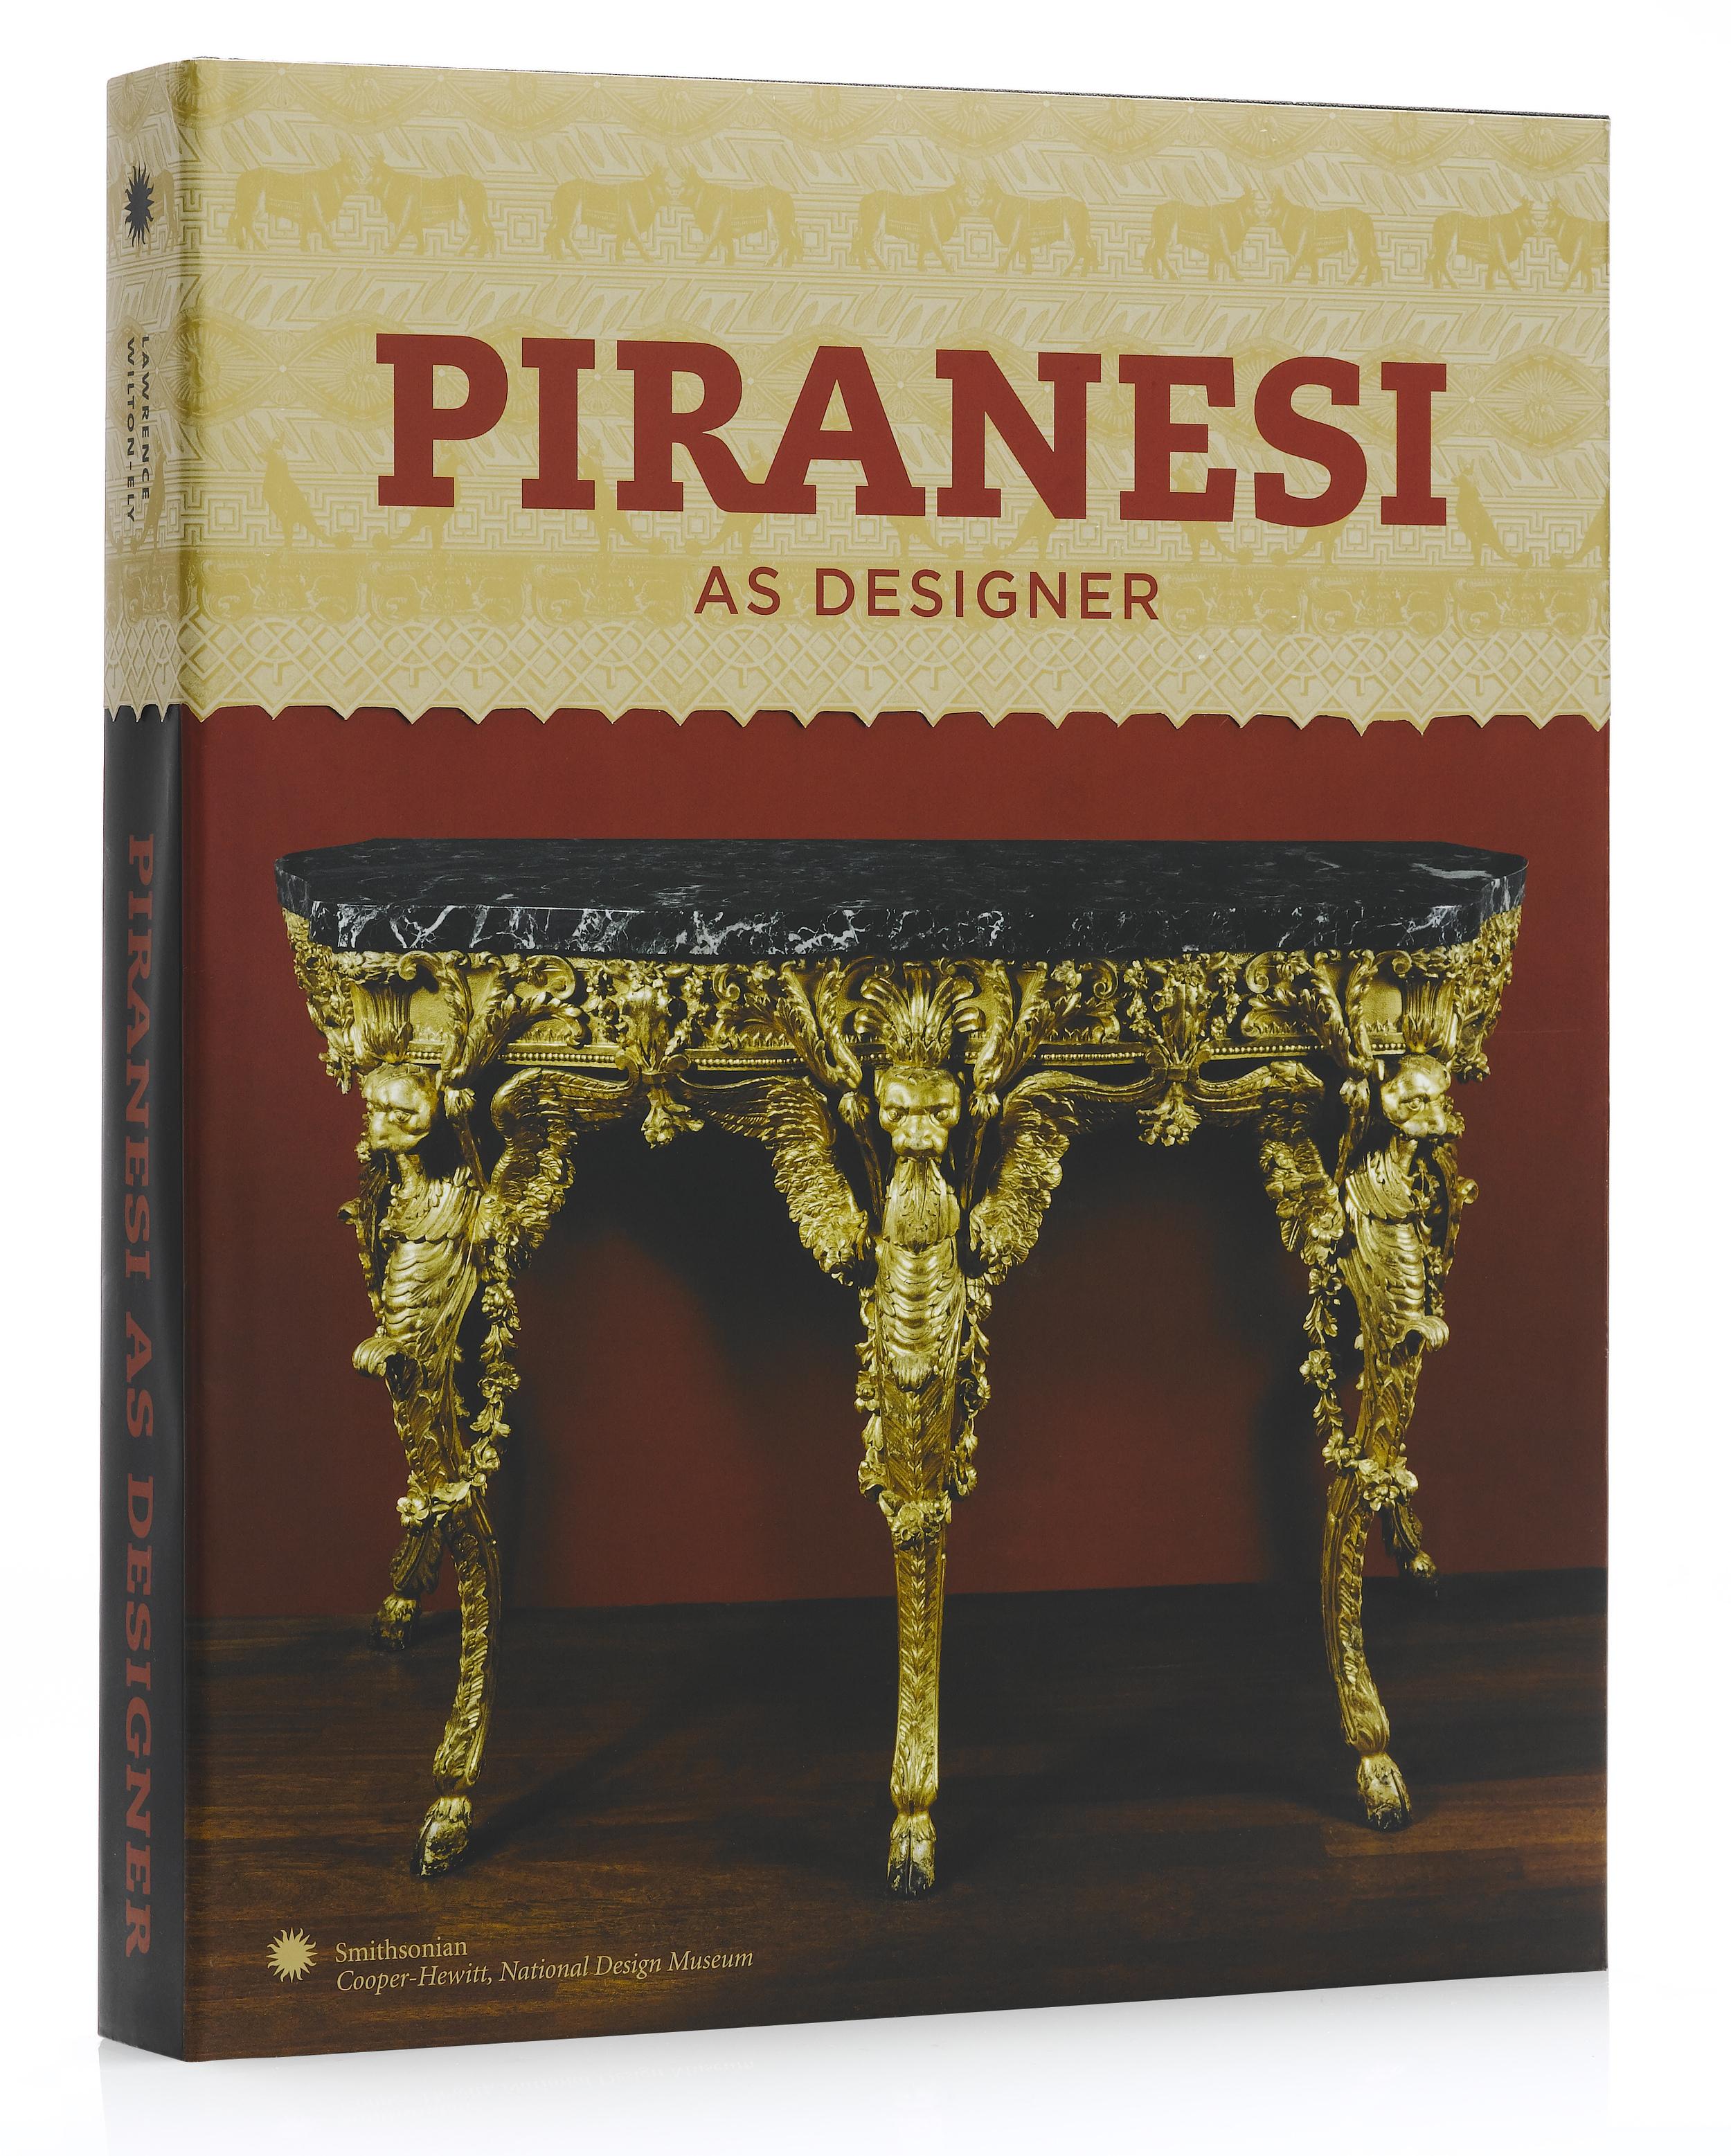 piranesi as designer cover_BEH.jpg